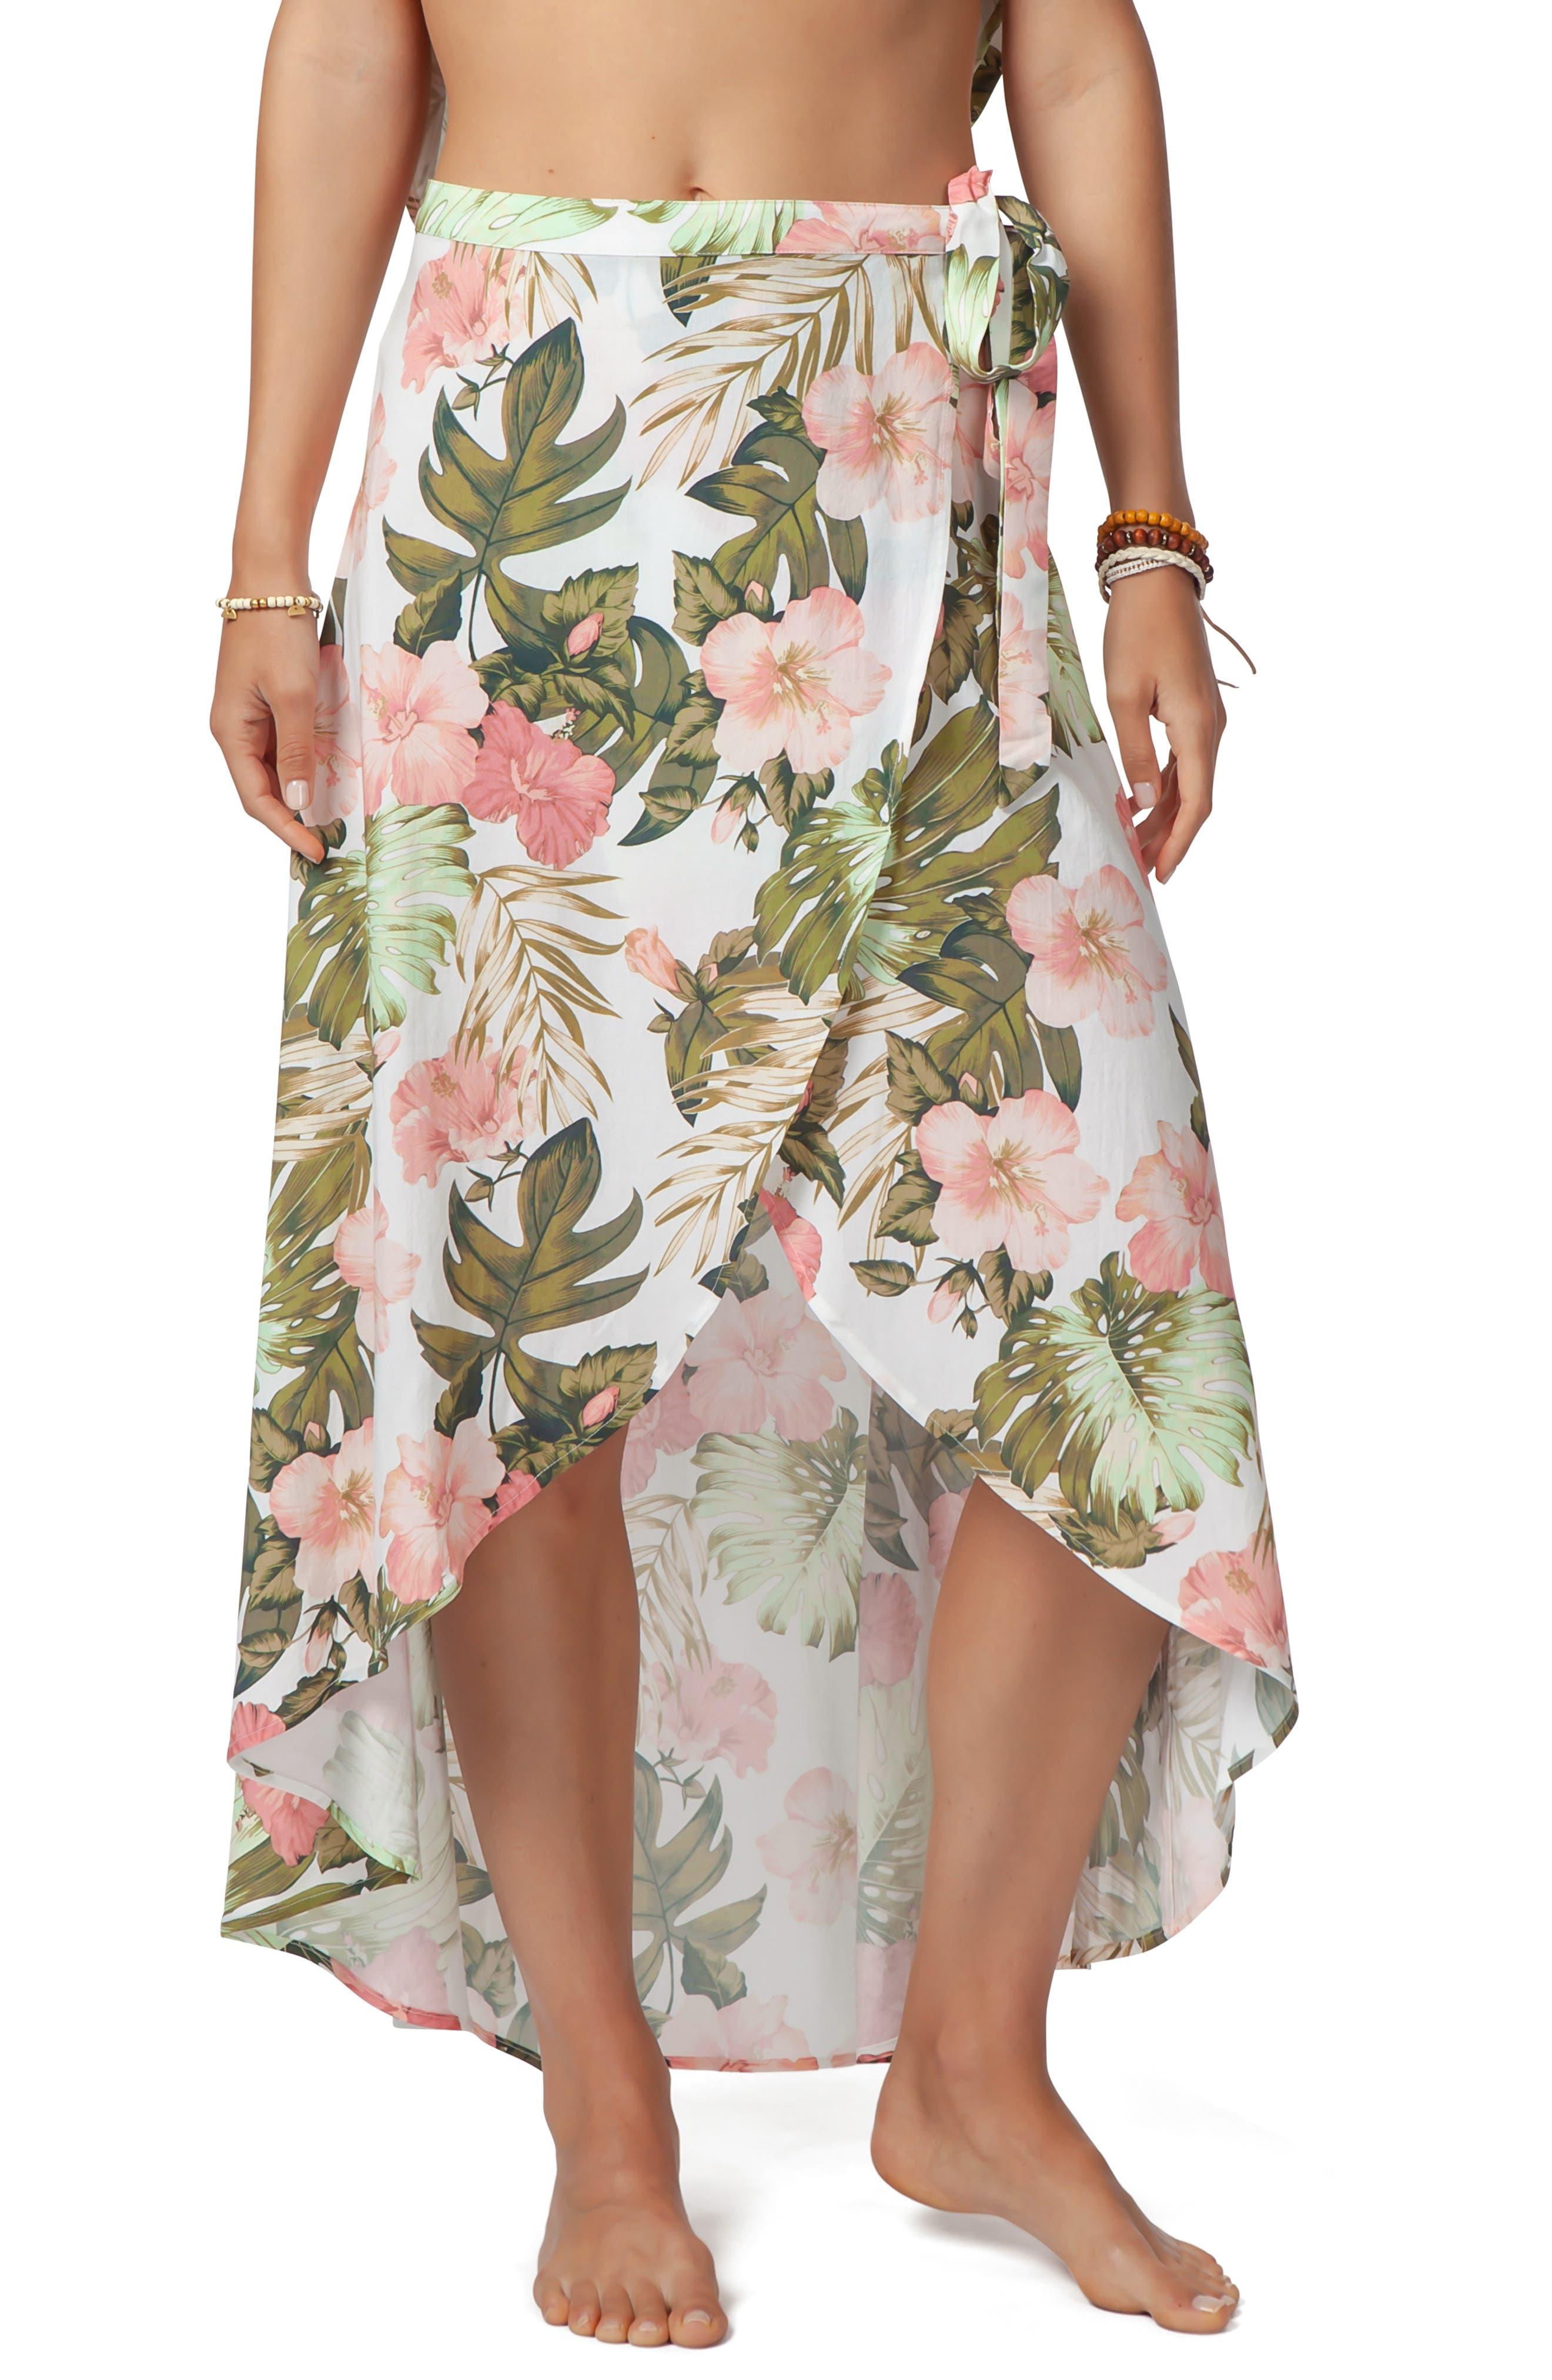 Rip Curl Hanalei Bay Wrap Skirt, White